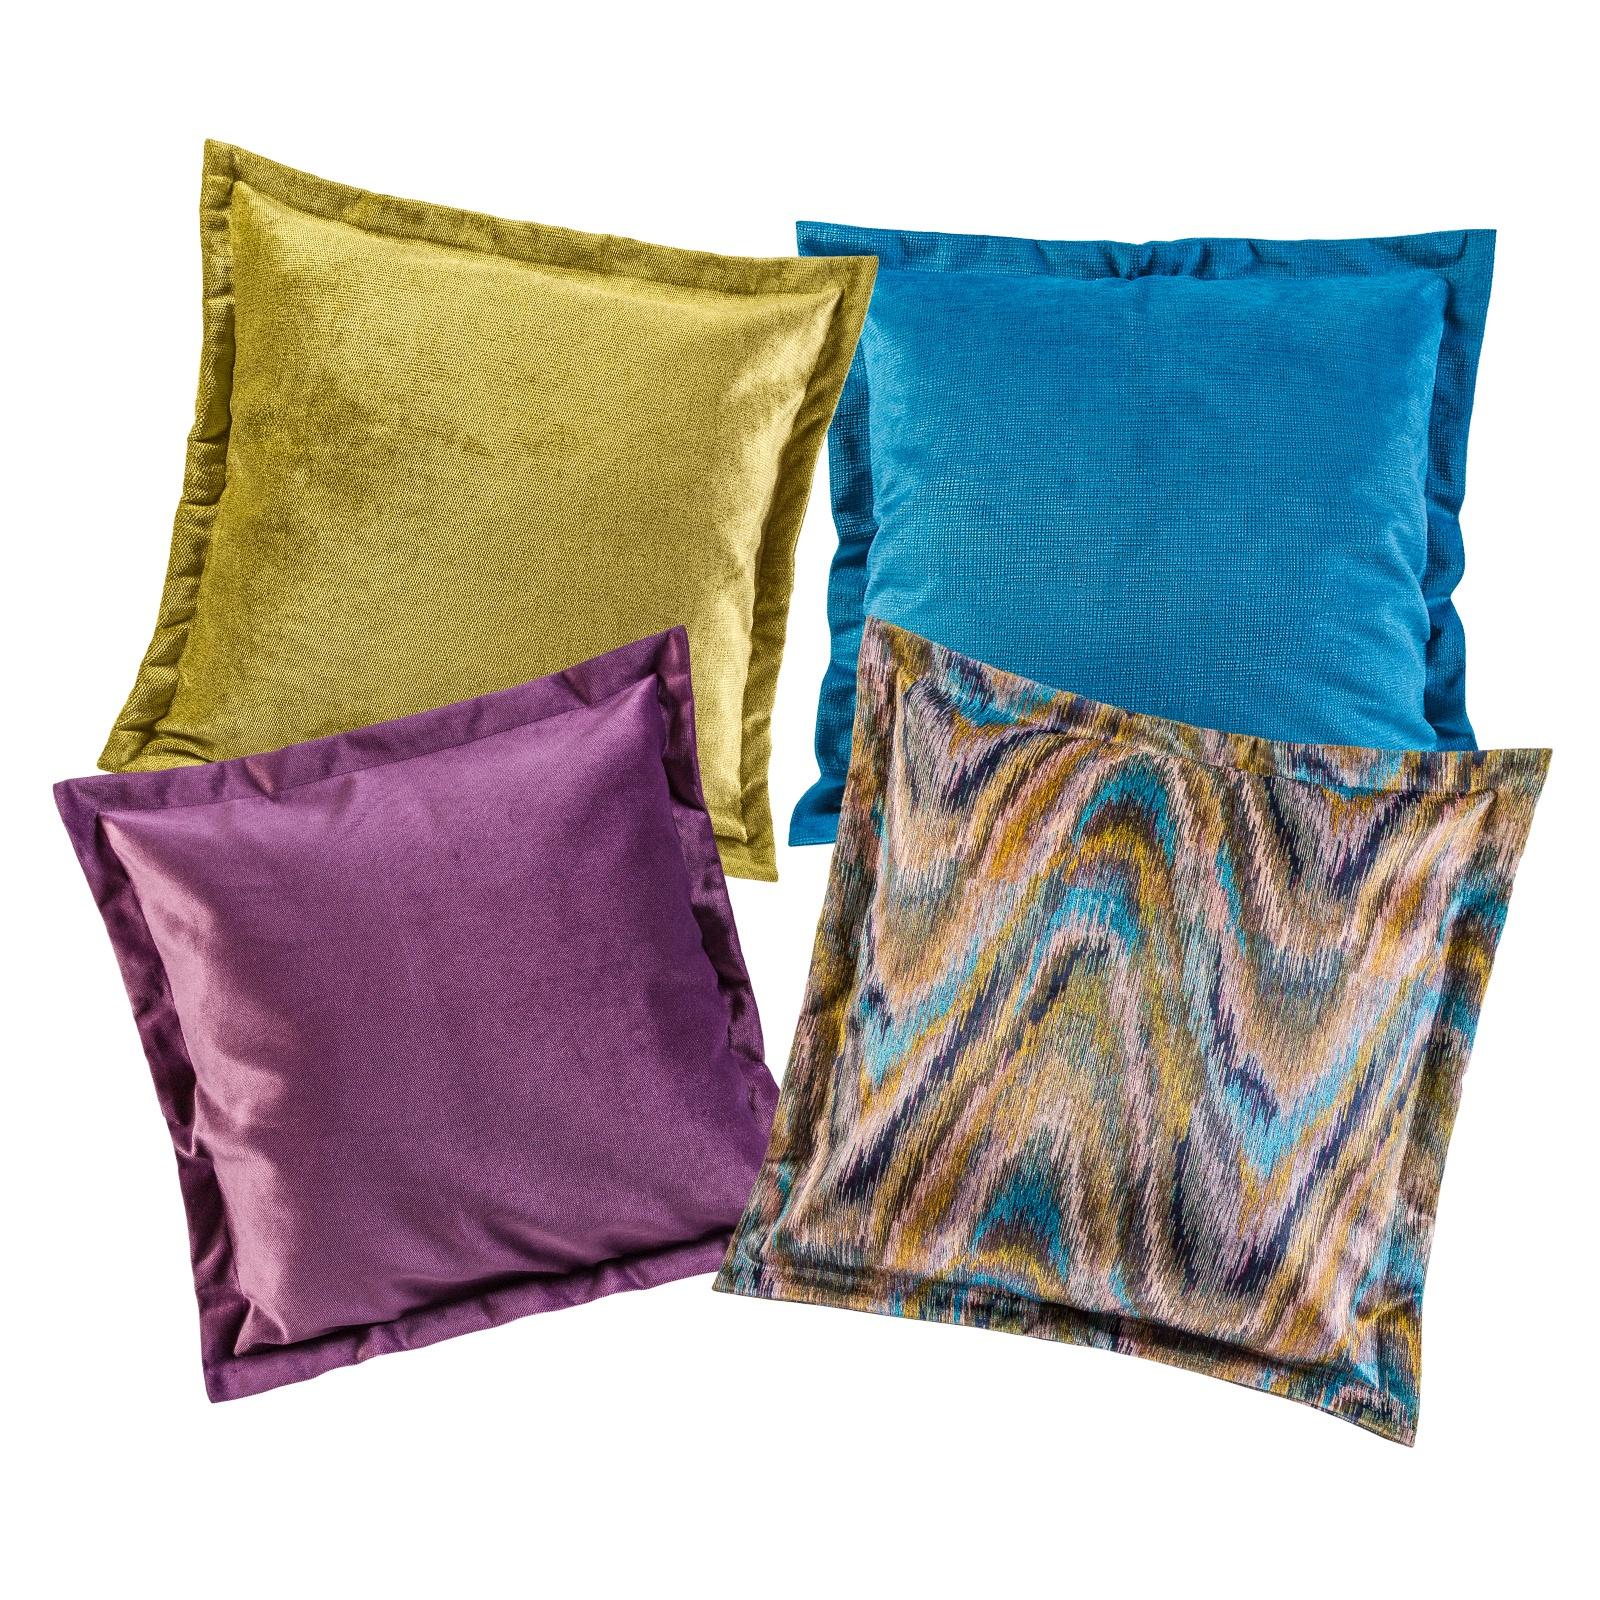 Комплект чехлов для подушек ALINA WAVE MUSTARD